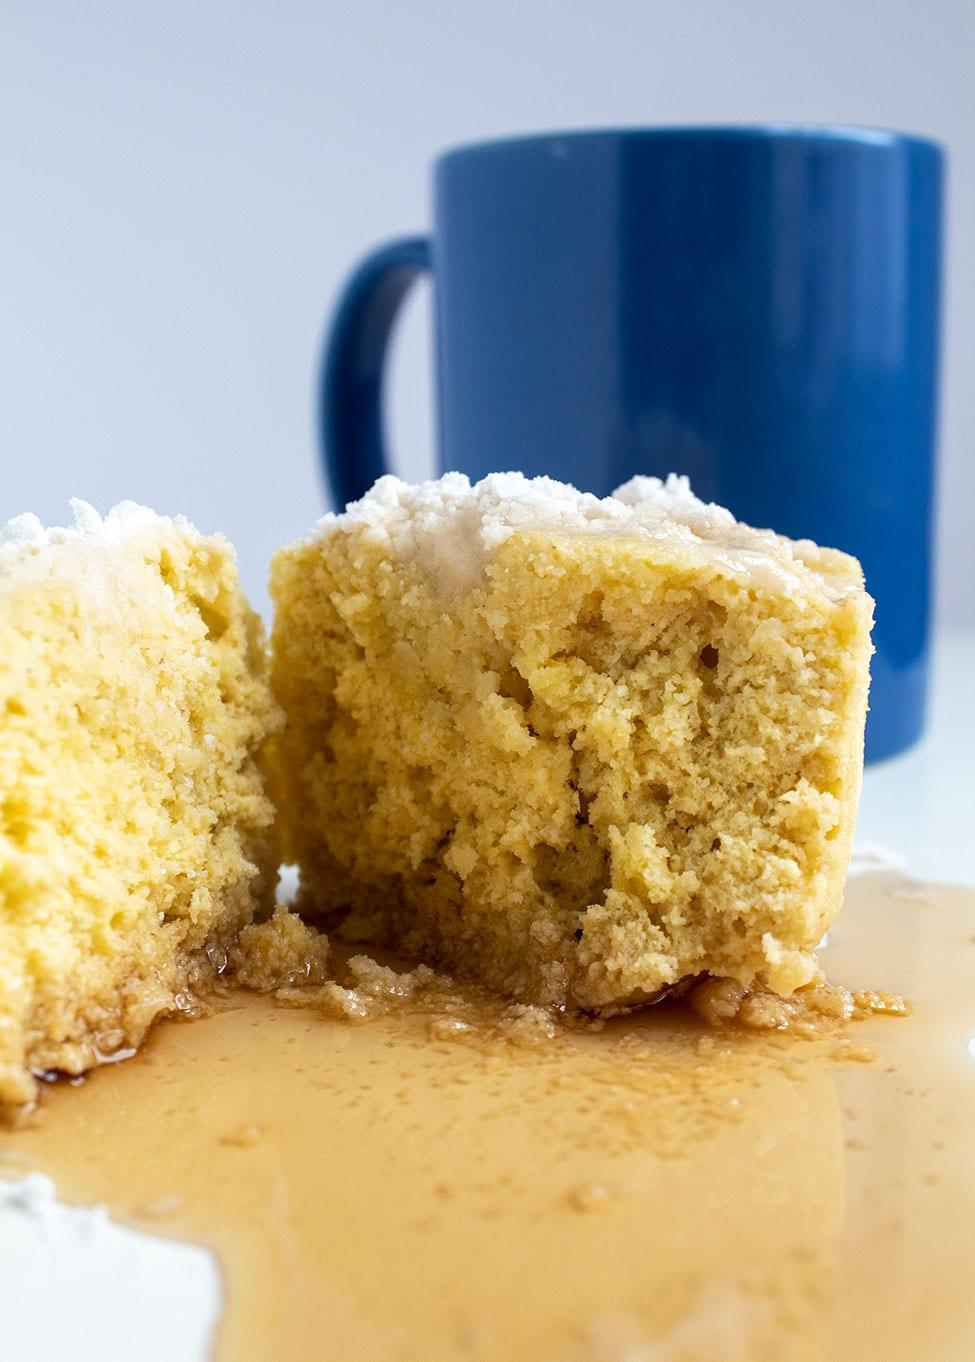 keto pancake mug cake in front of a blue mug with cake split in half